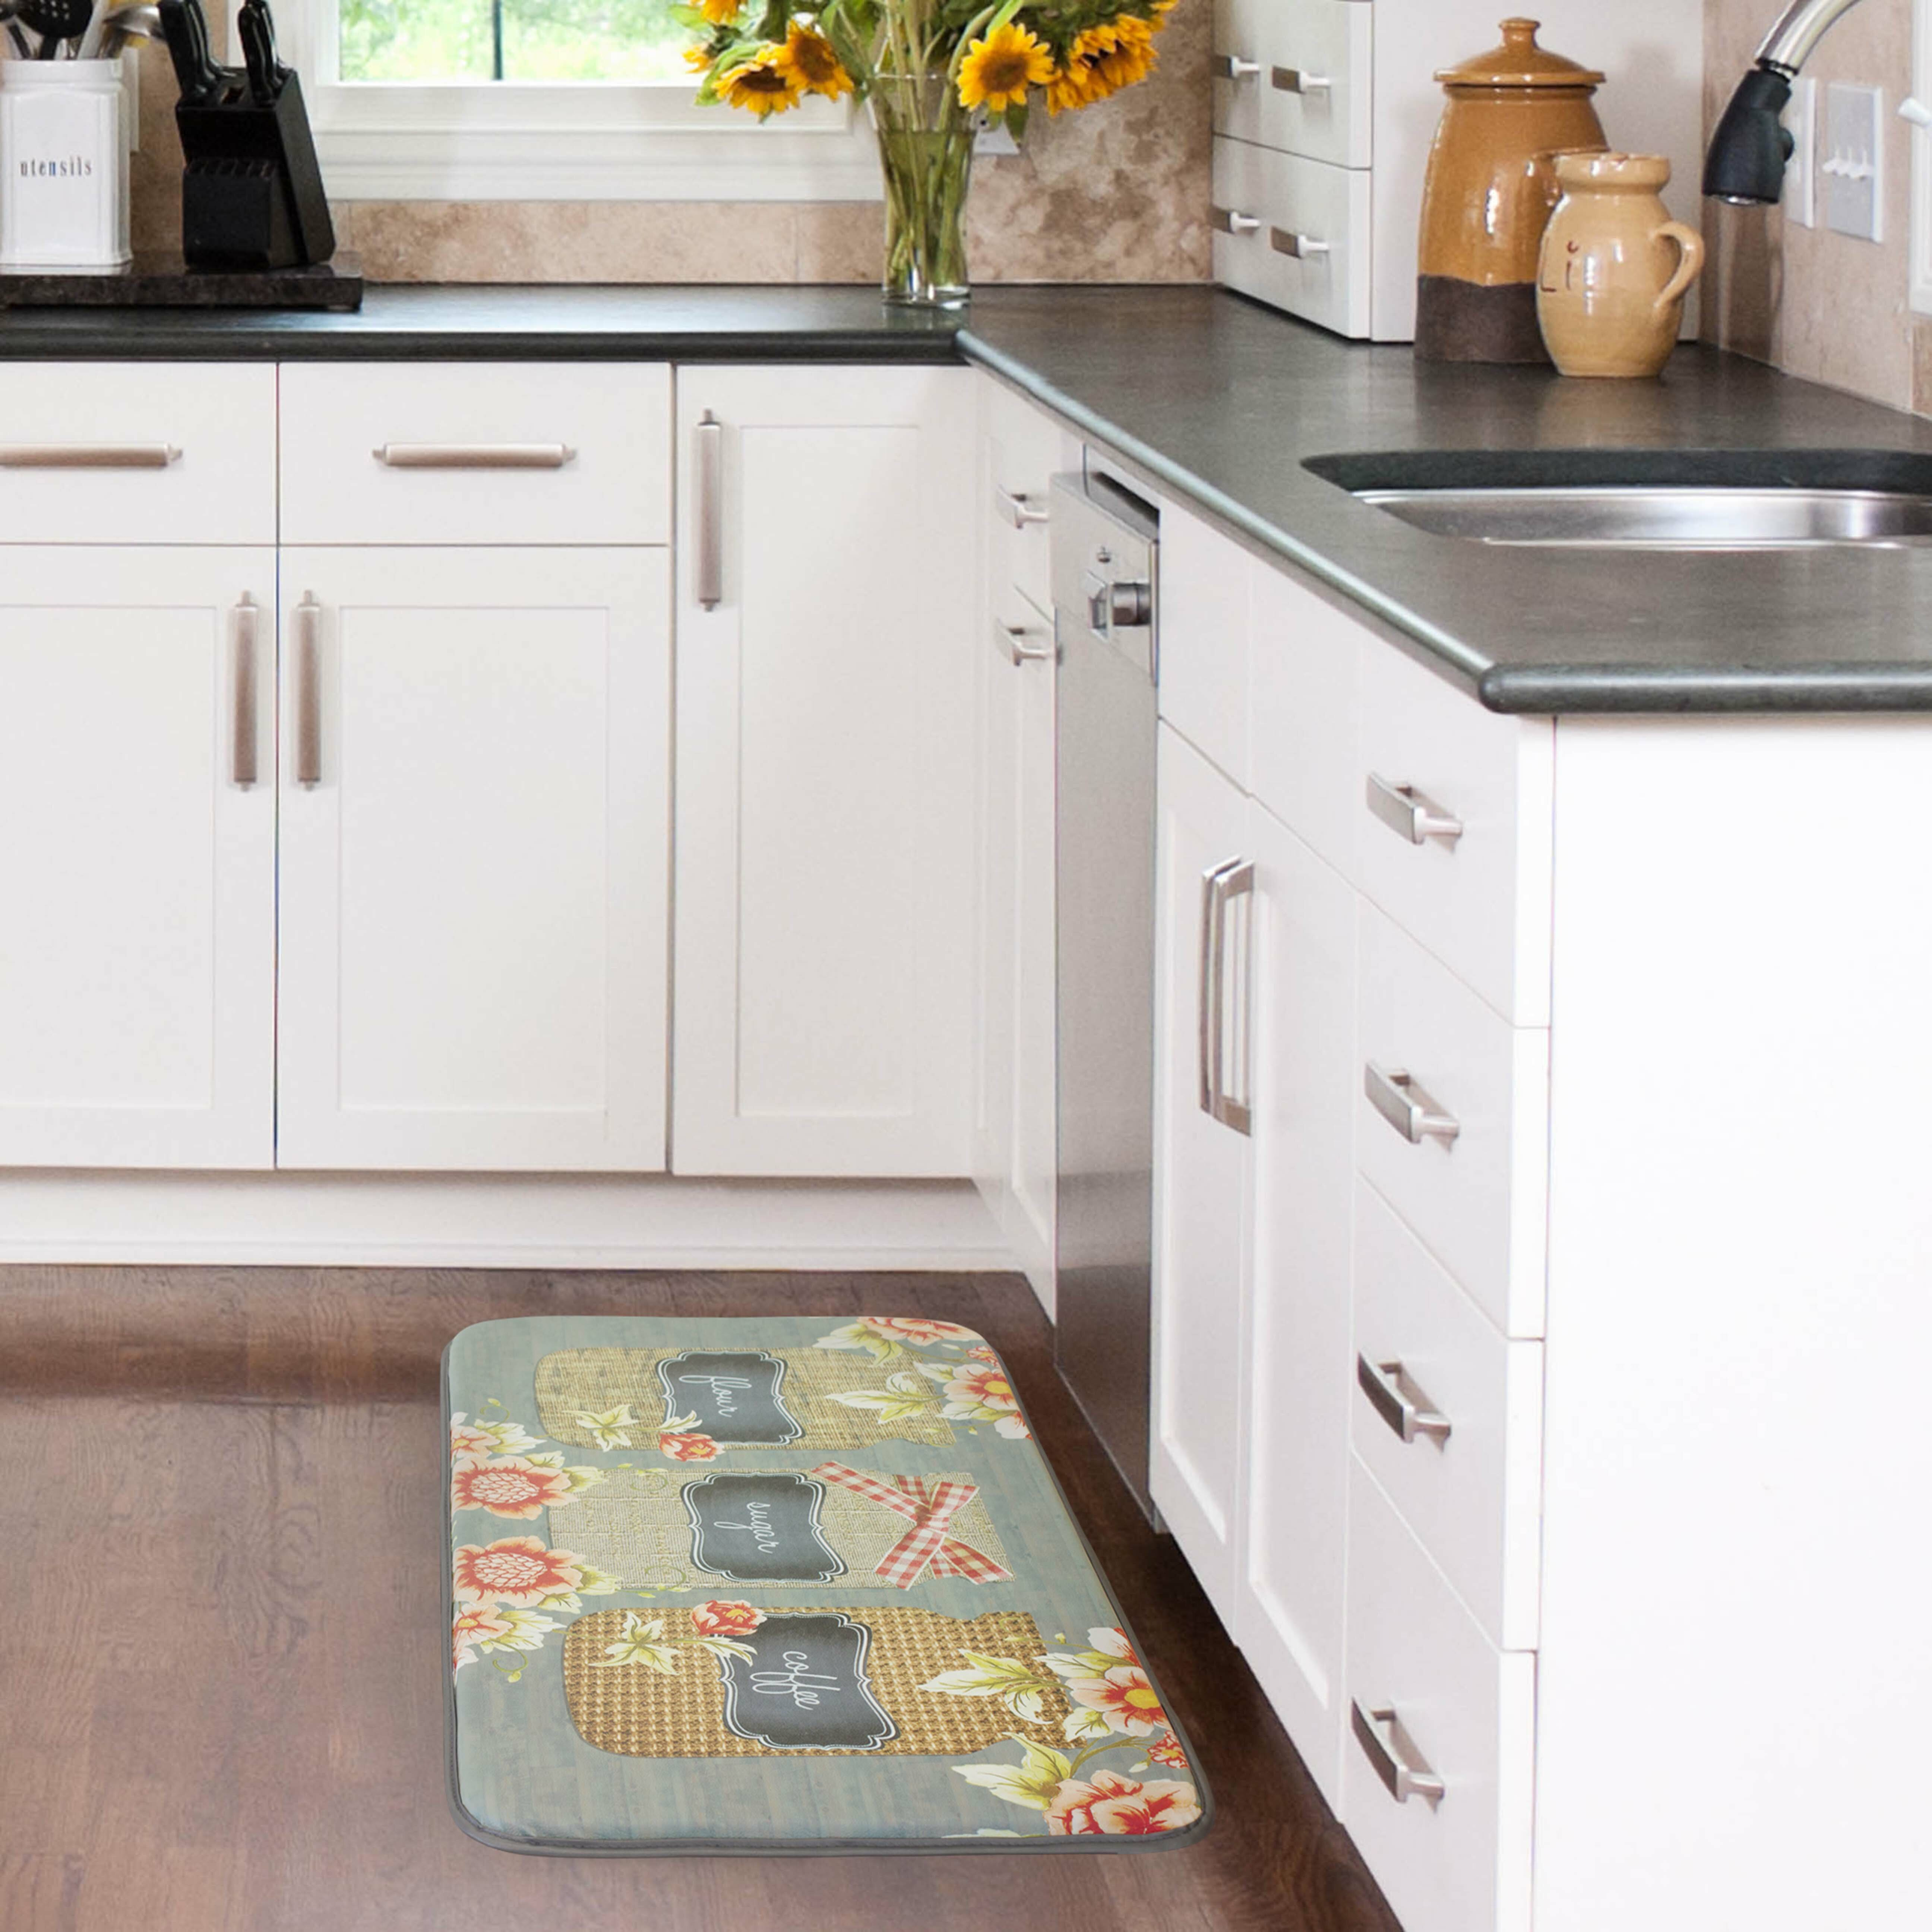 Crate And Barrel Kitchen Rugs Chef Gear Farmers Jar Anti Fatigue Kitchen Mat Reviews Wayfair